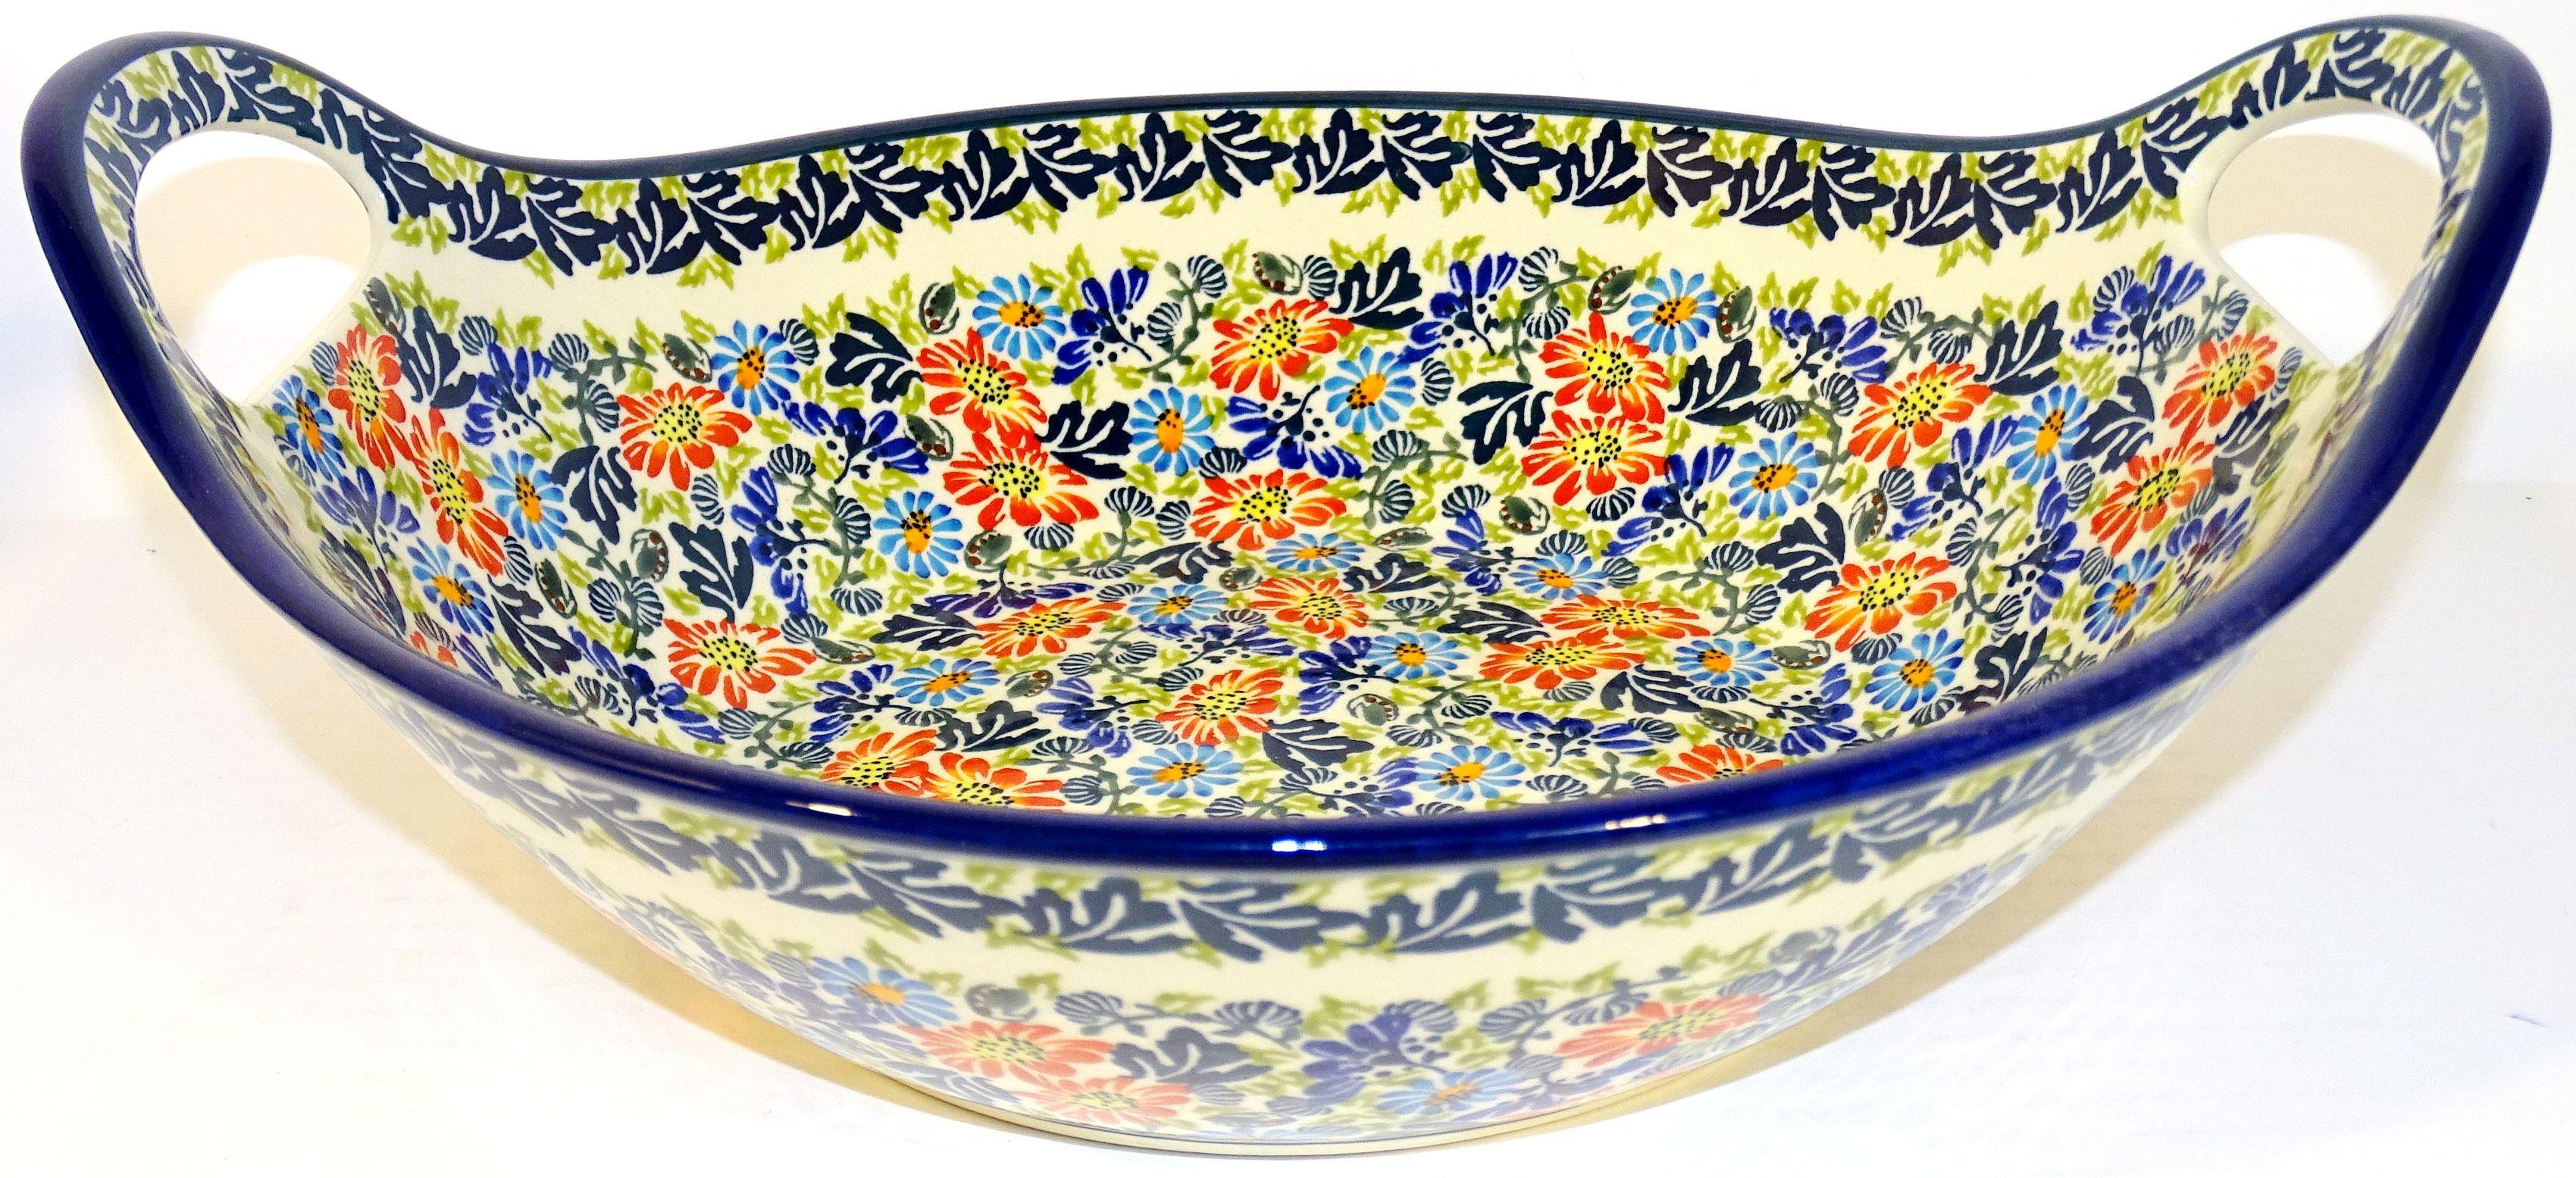 "Pottery Avenue Bliss 13"" Handled Stoneware Baker | Serving Bowl"